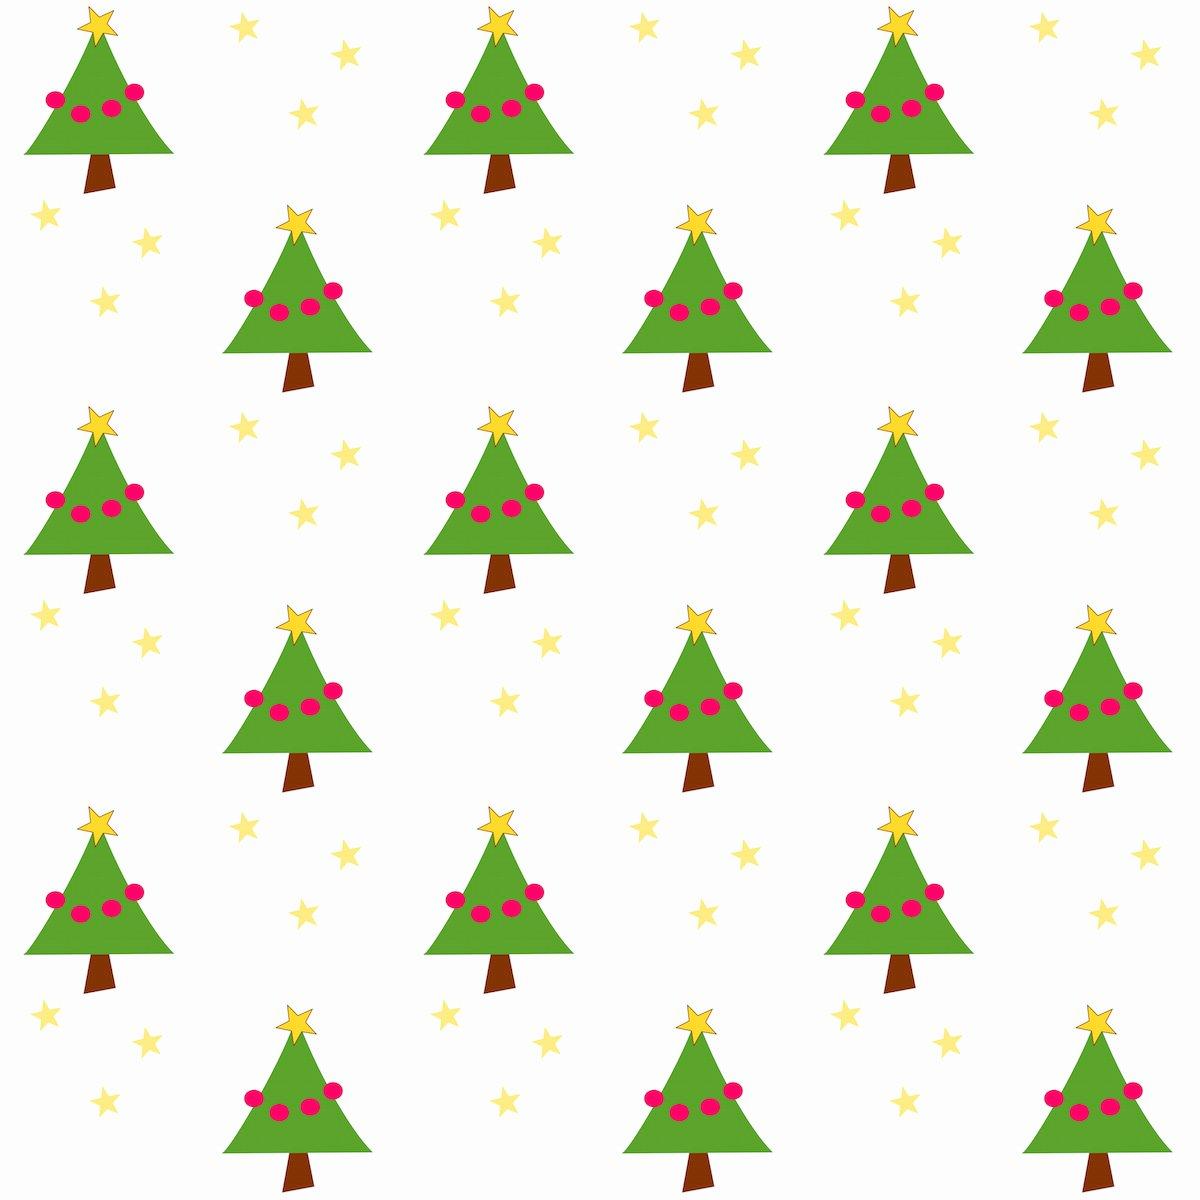 Free Printable Christmas Paper Best Of Free Digital Christmas Scrapbooking Paper Ausdruckbares